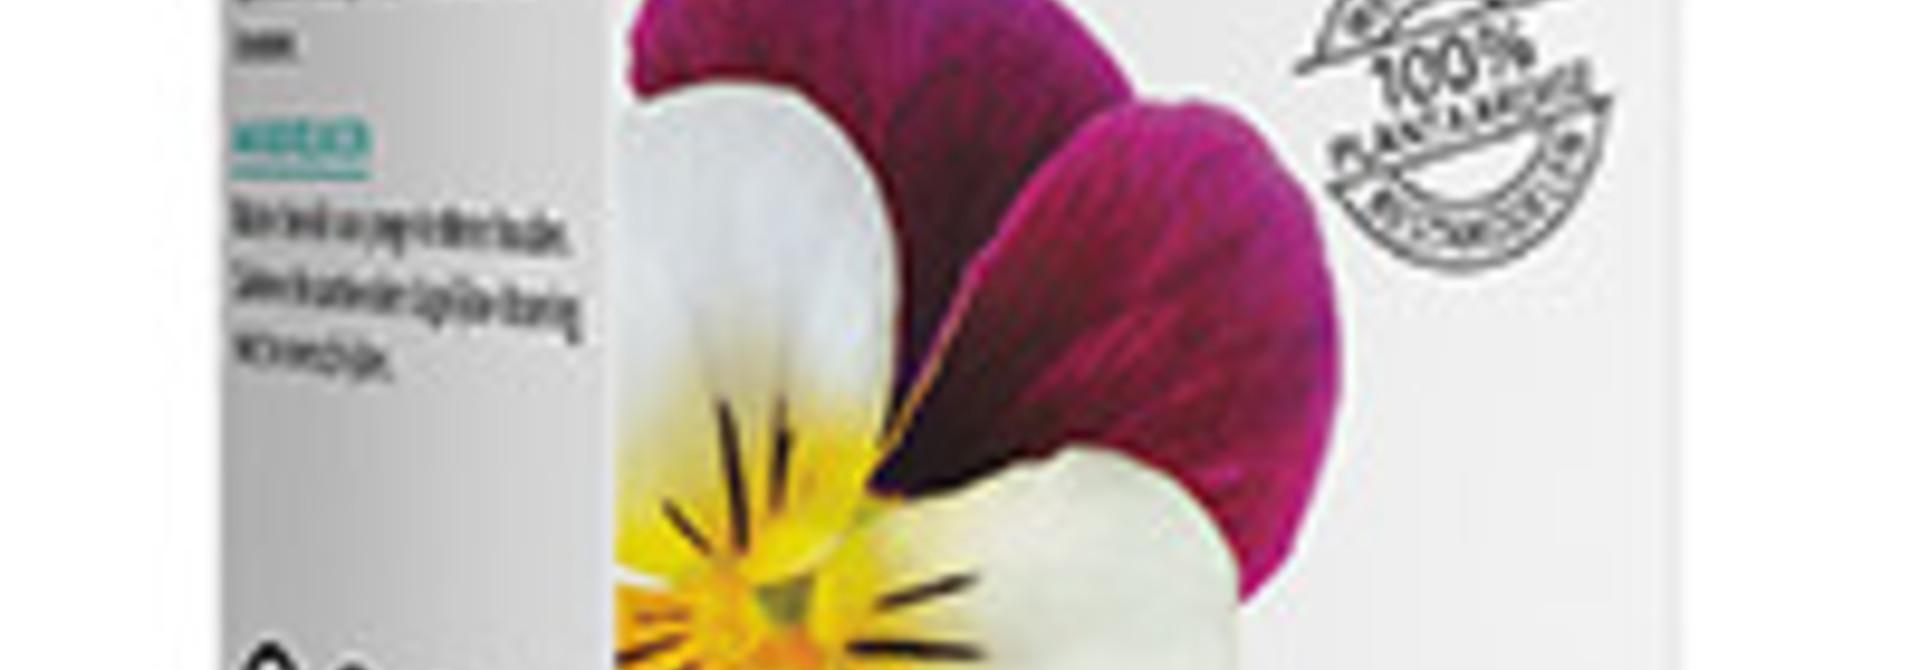 Driekleurig viooltje 45 capsules